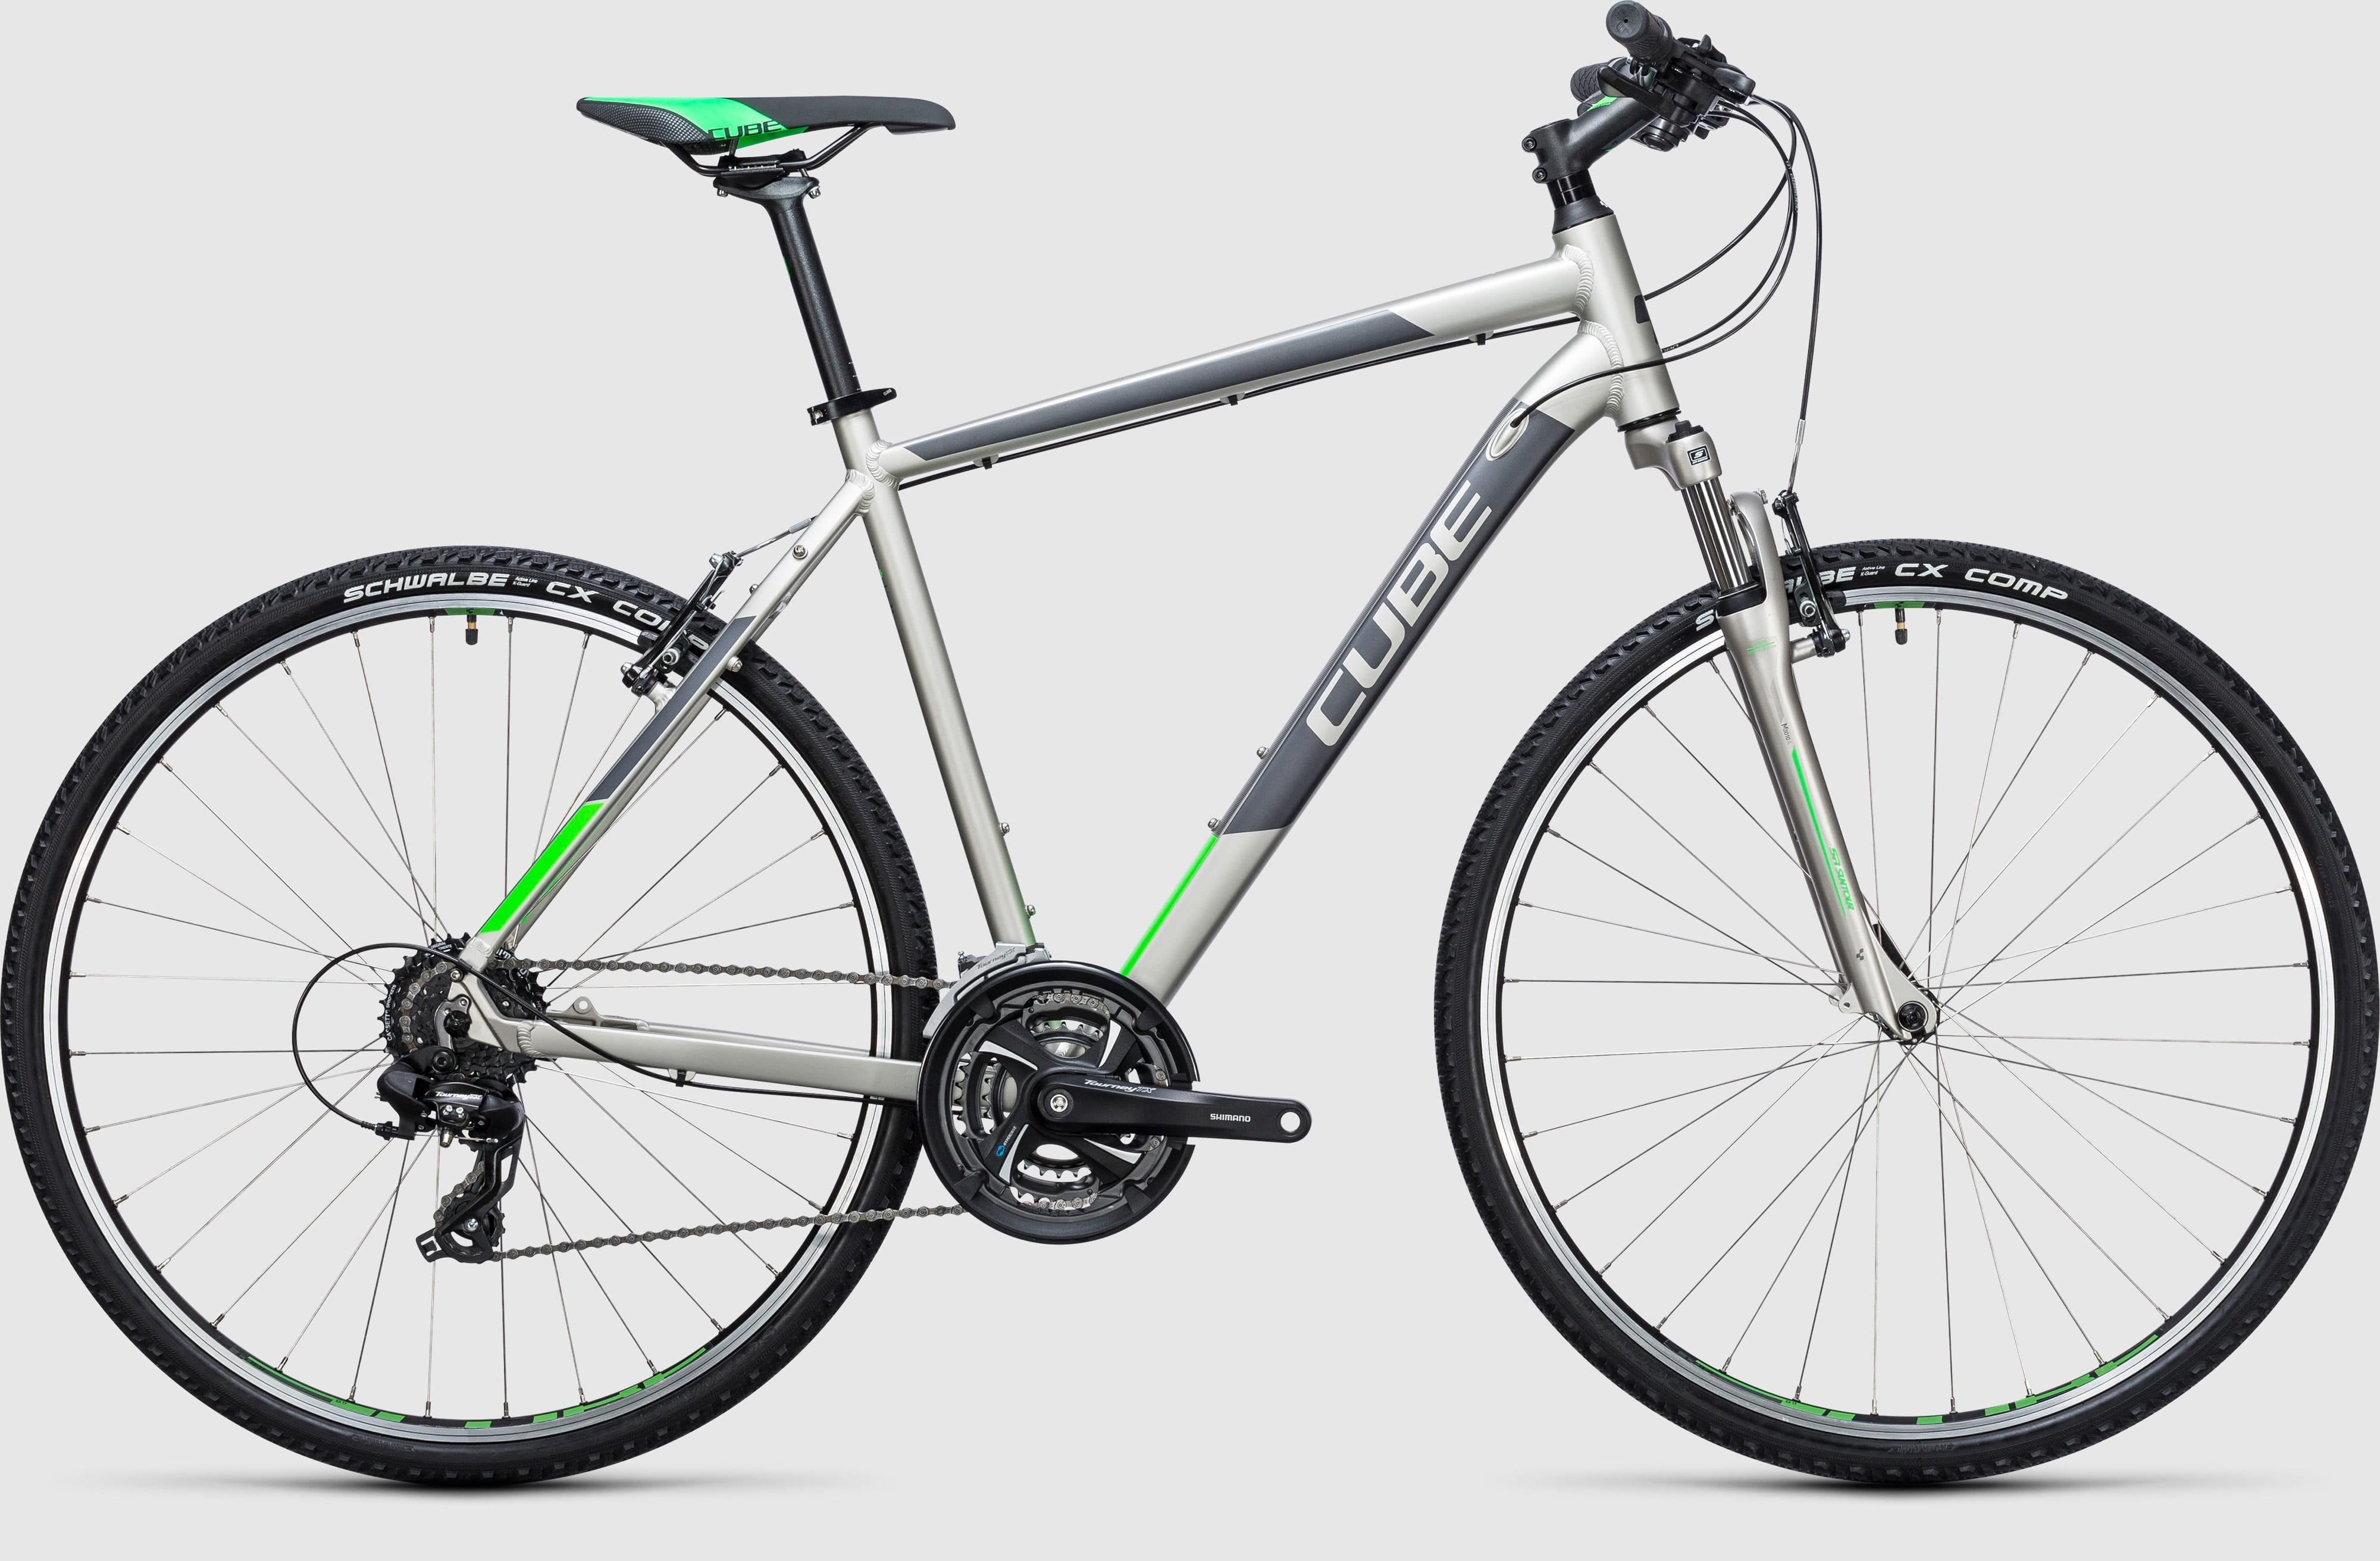 Cube Curve Hybrid Bike 2017 All Terrain Cycles